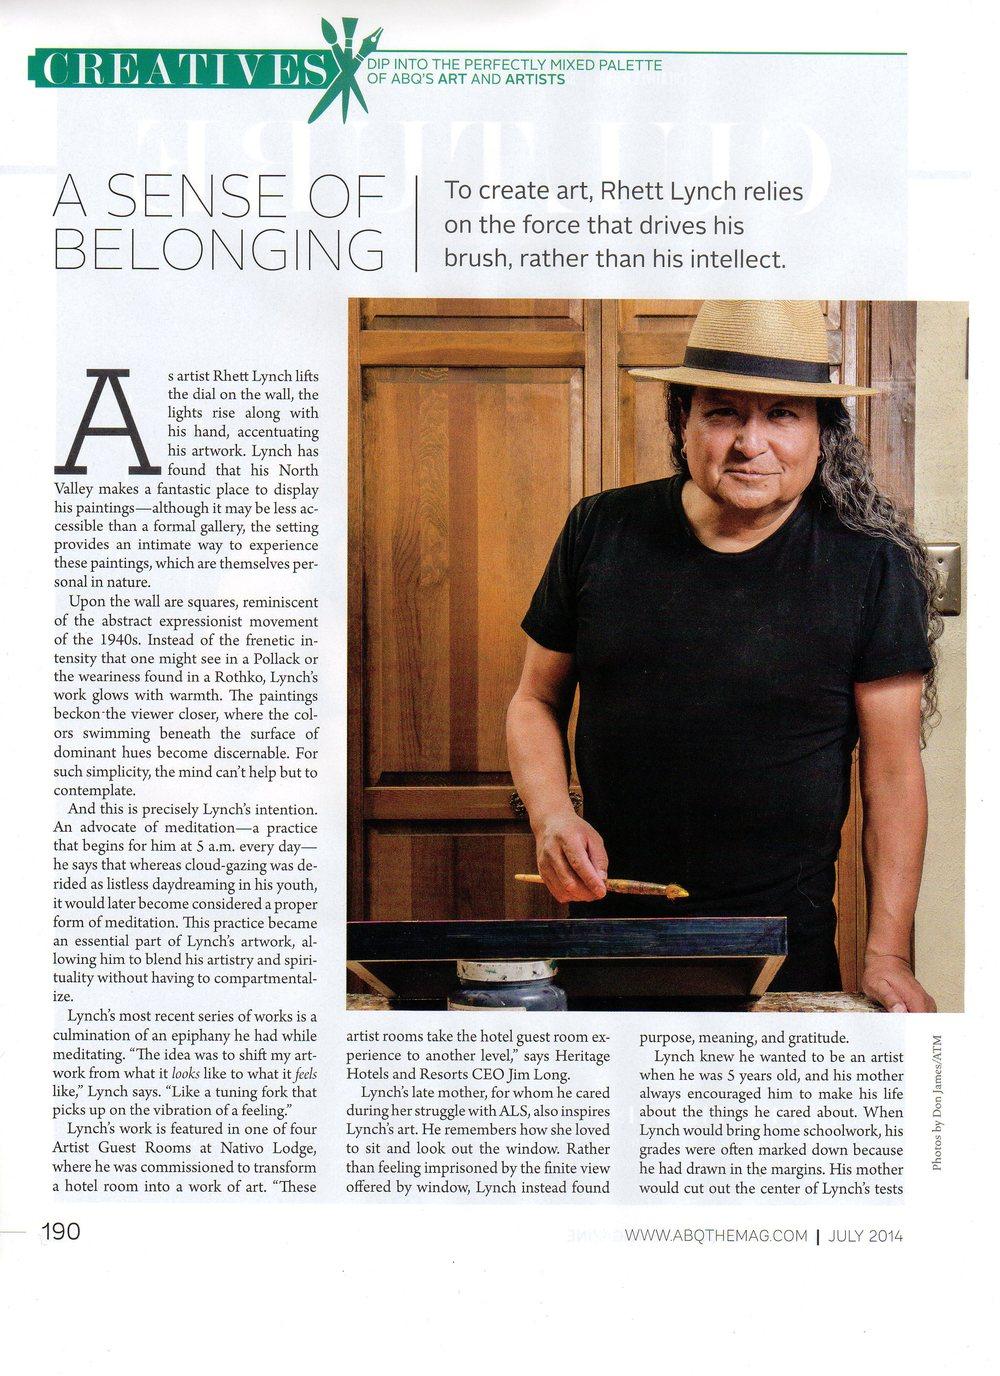 abq the magazine 2014 p190